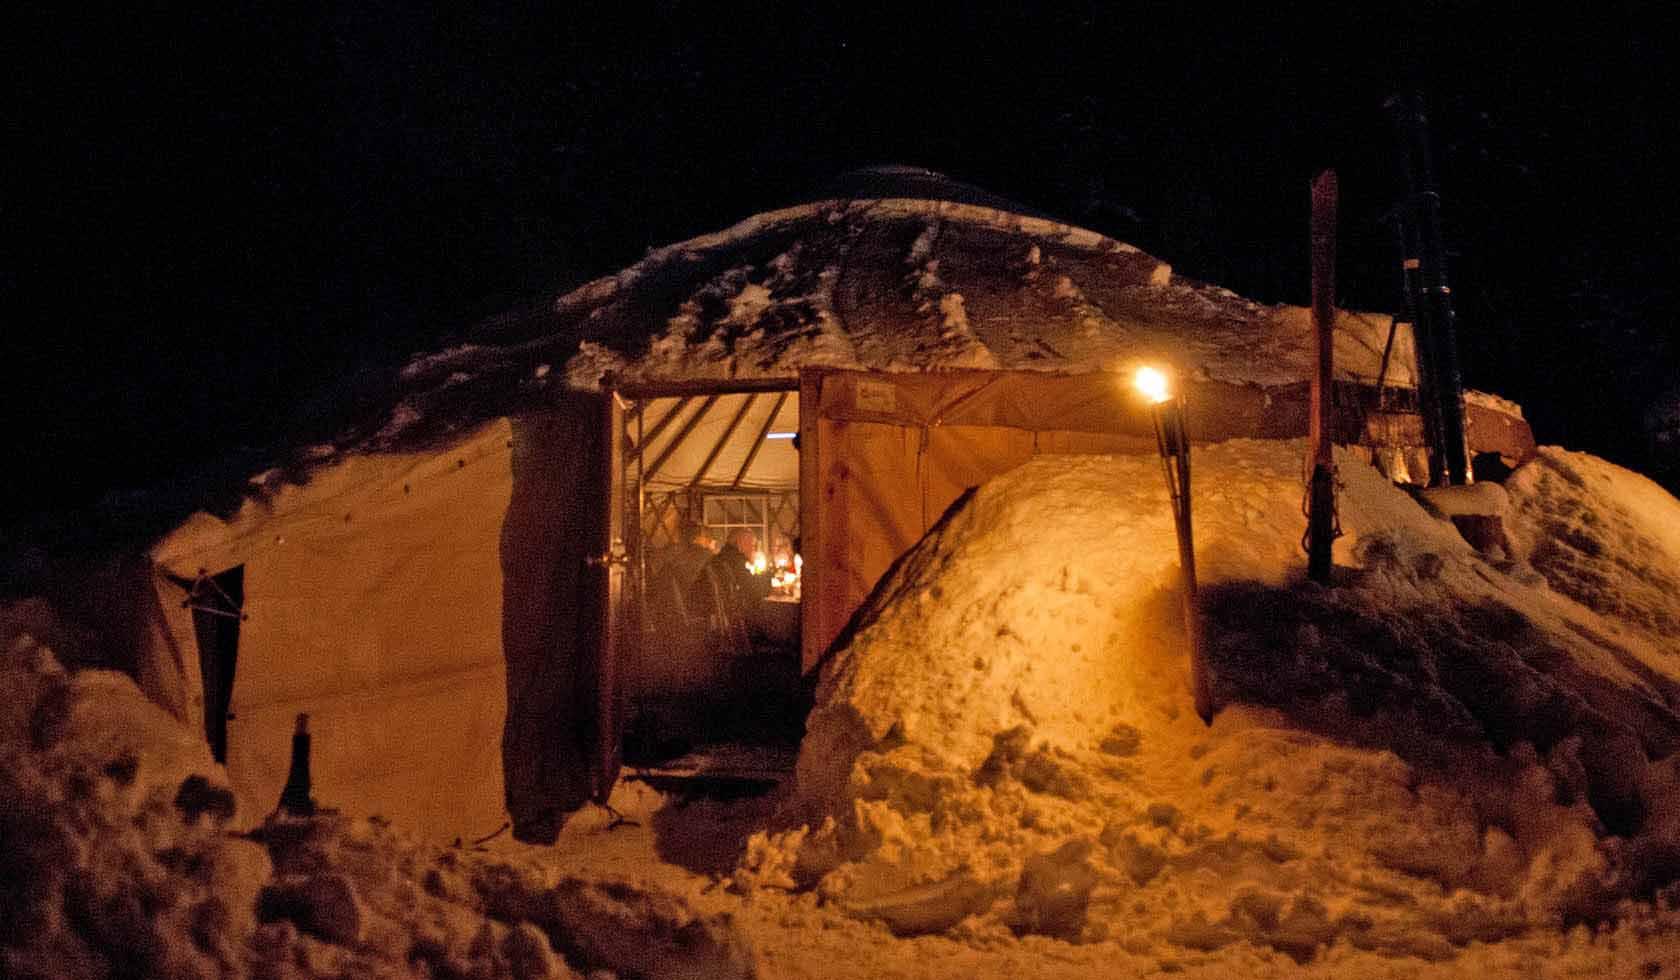 Montana Backcountry Adventures: The Montana Dinner Yurt profile image